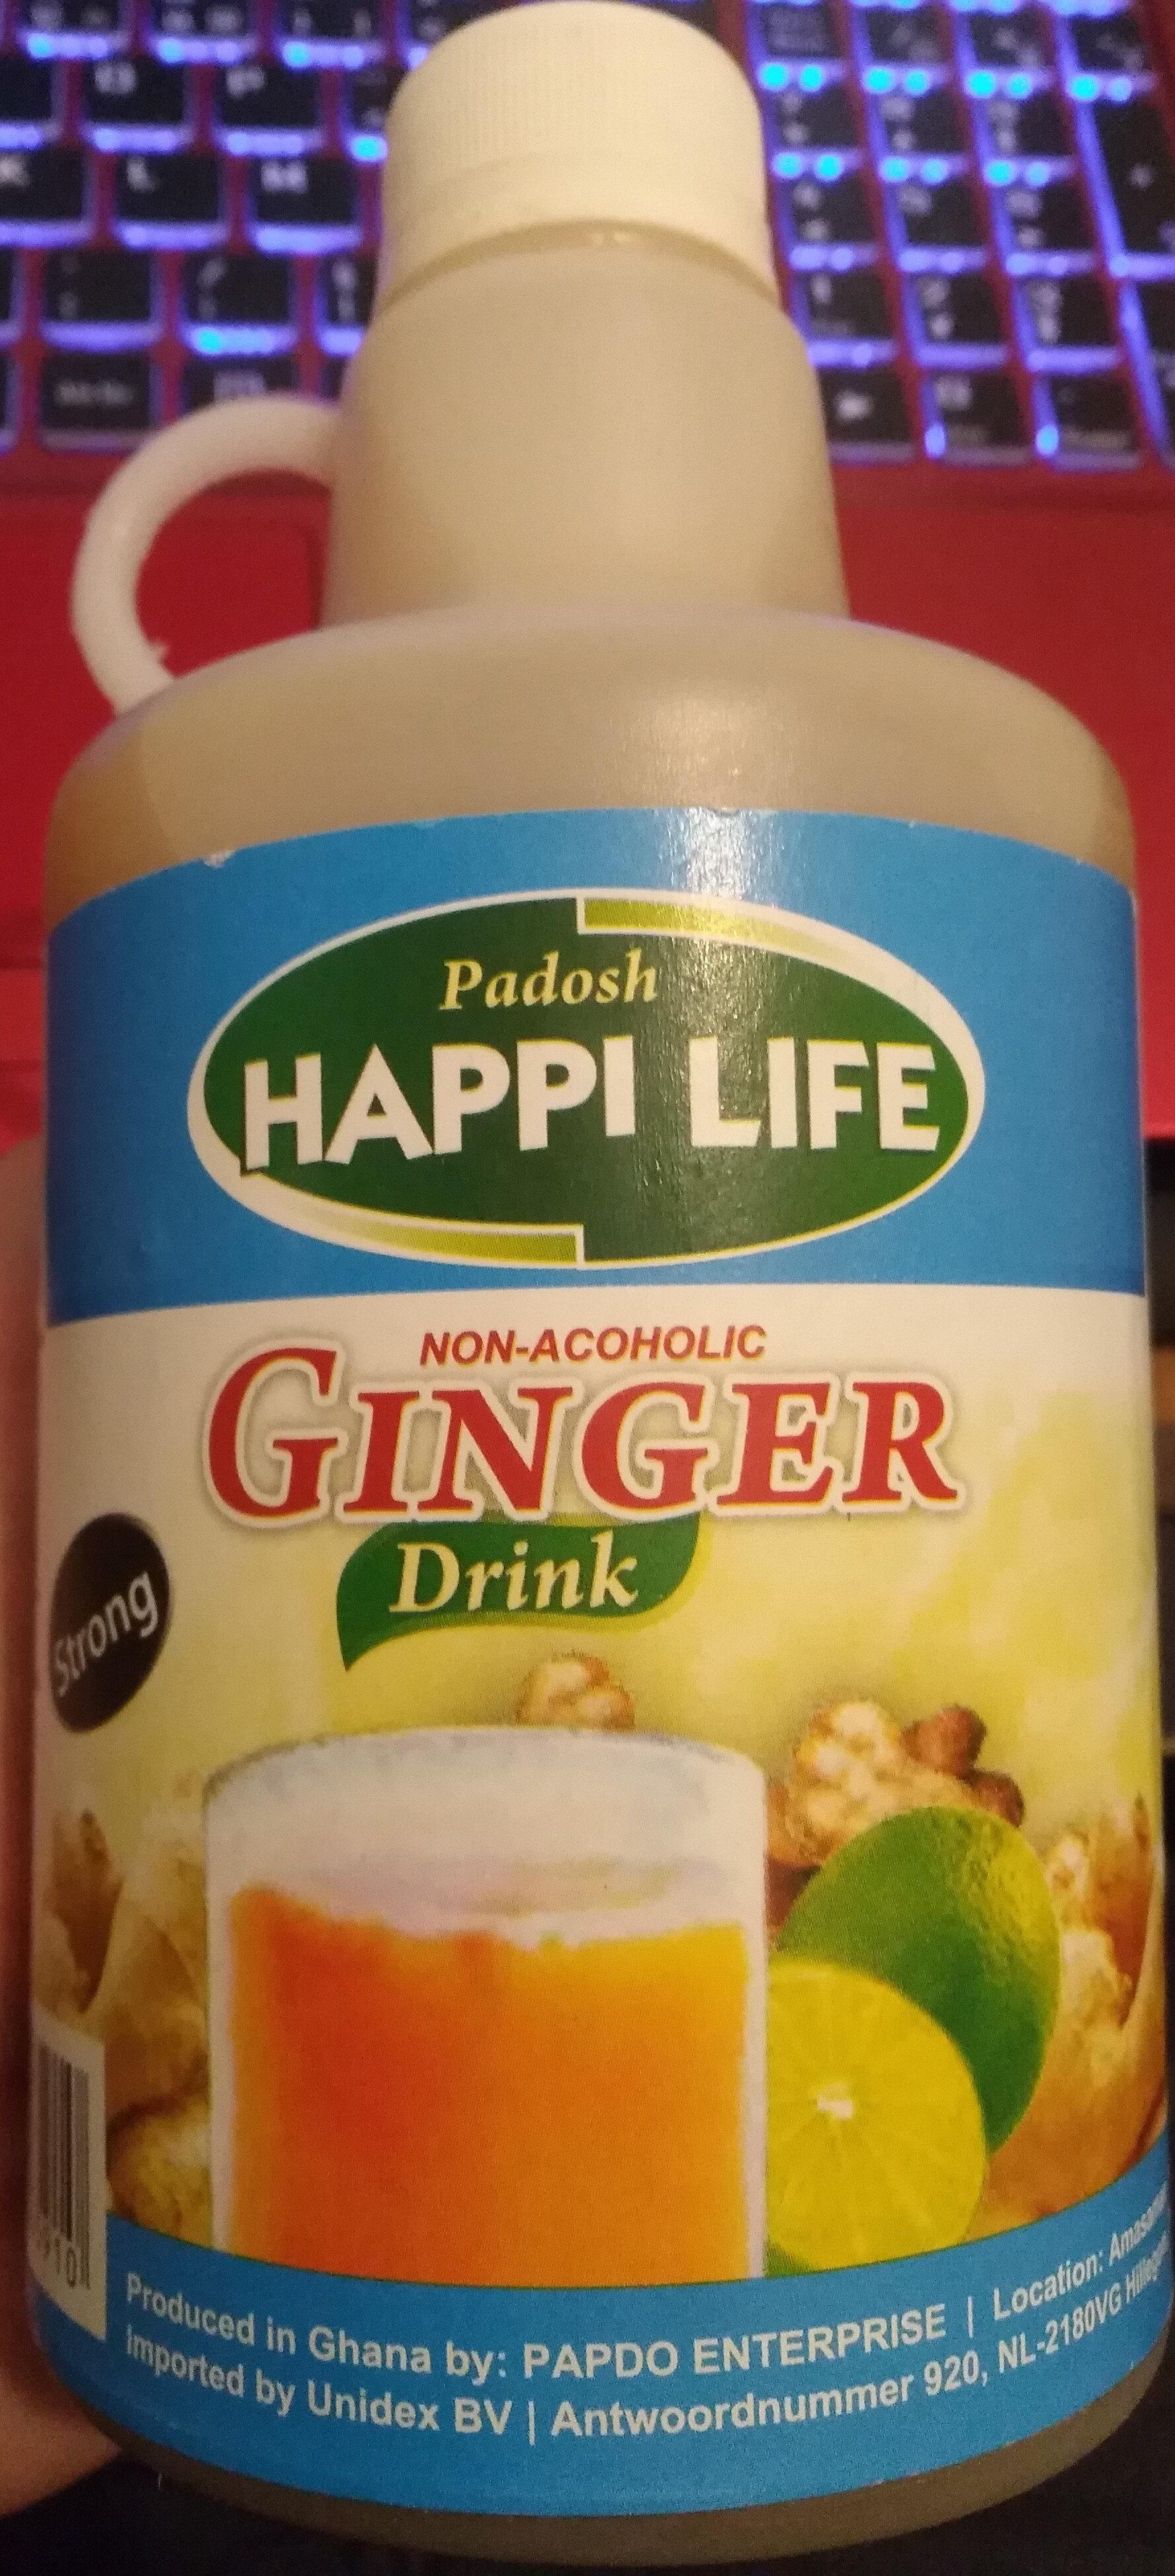 Non-alcoholic ginger drink - Produit - fr